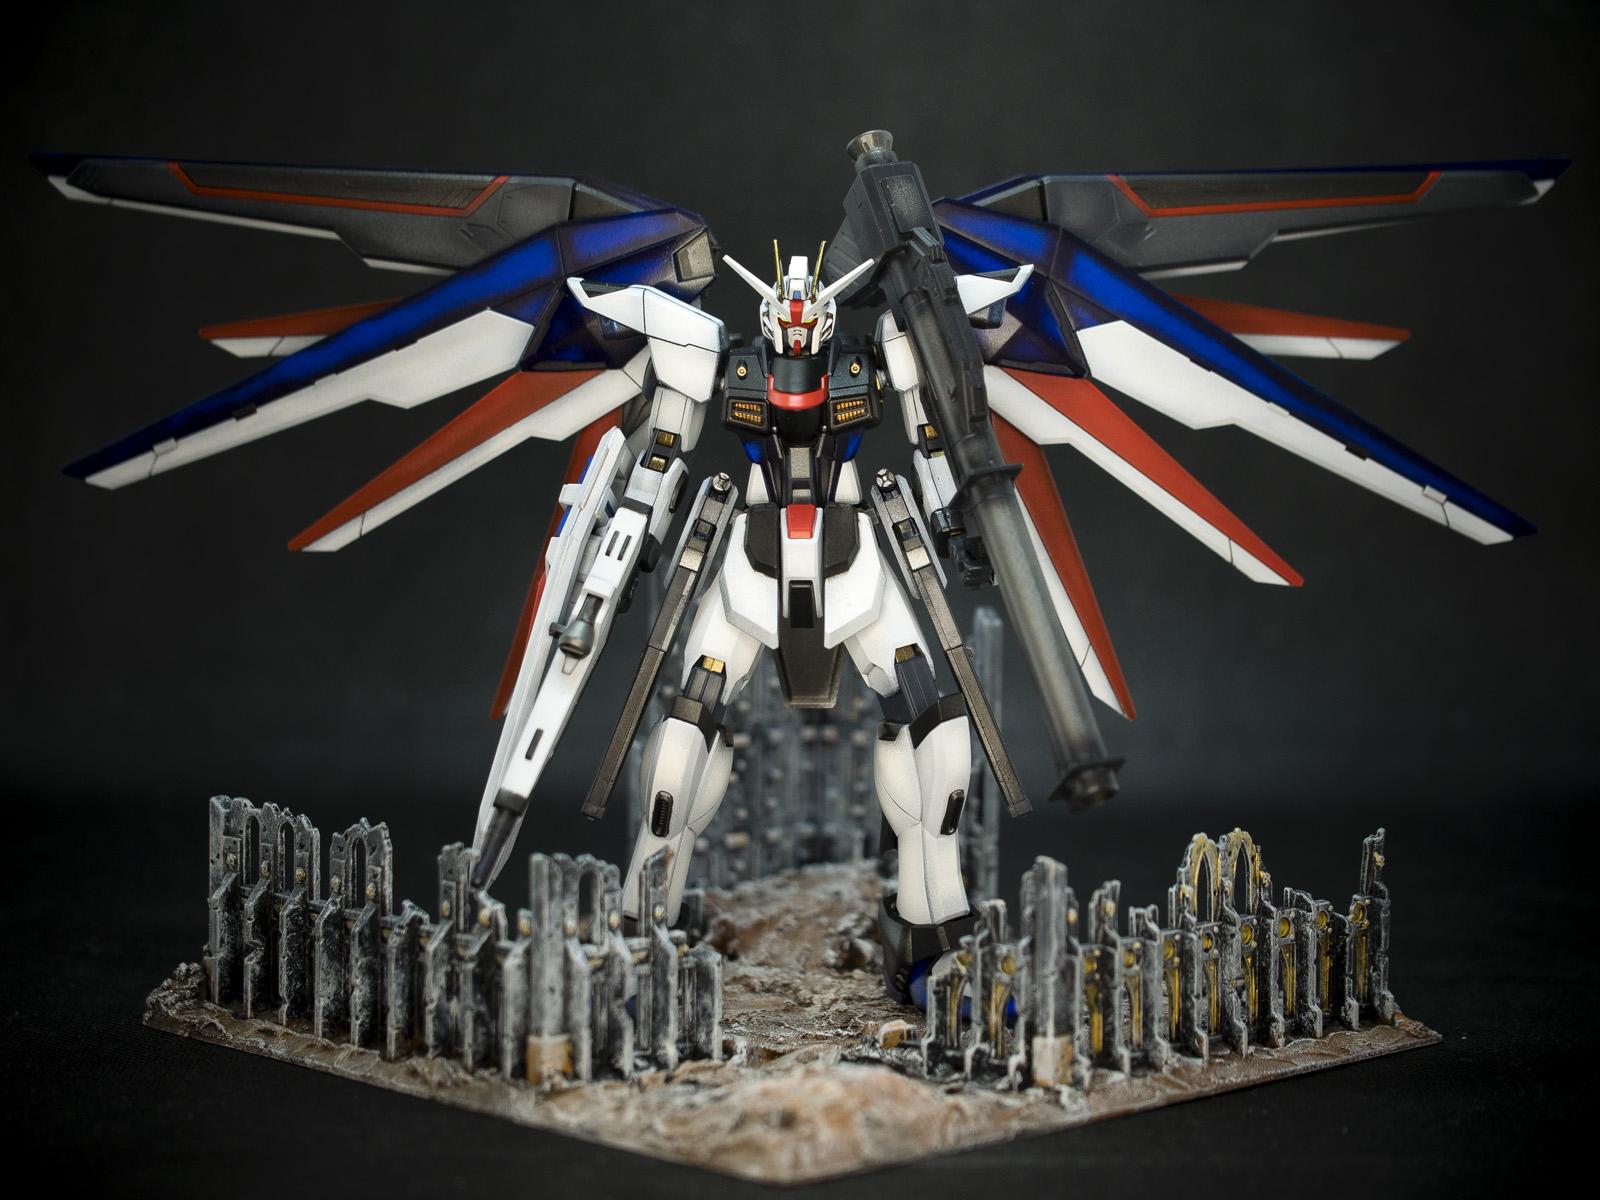 Bandai 1/144 HGCE ZGMF-X10A Freedom Gundam